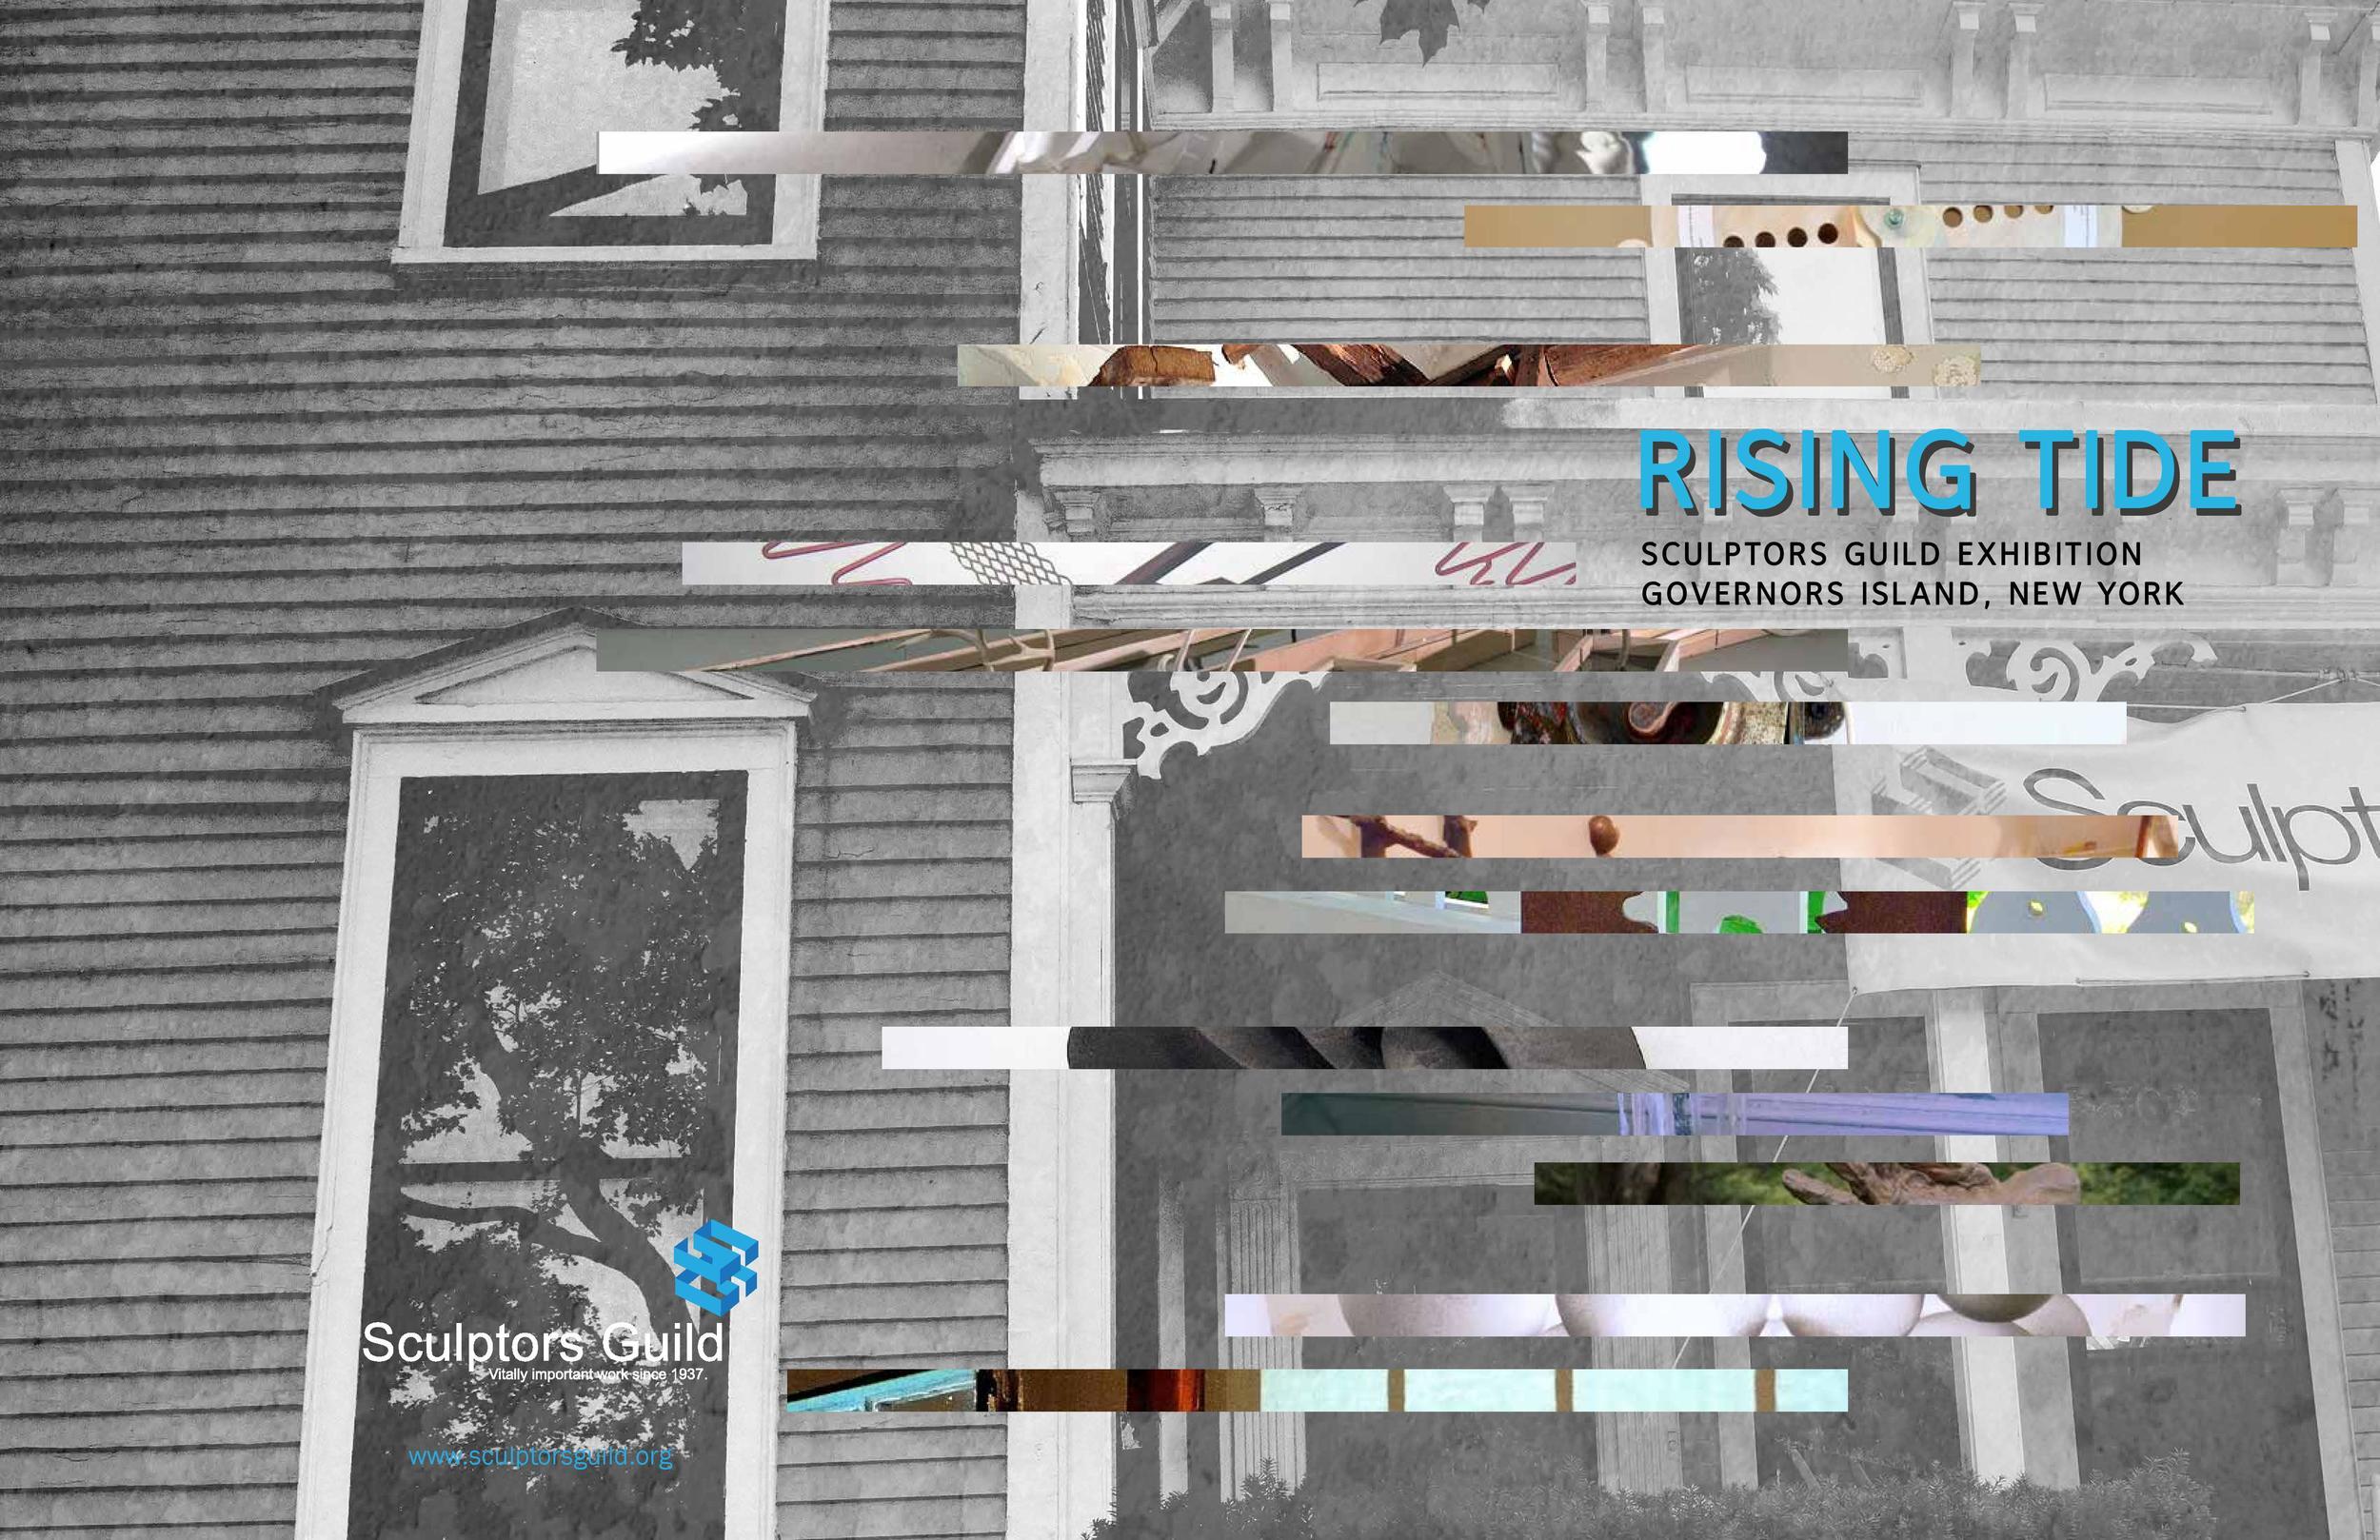 RisingTide_2013_YG-page-001.jpg